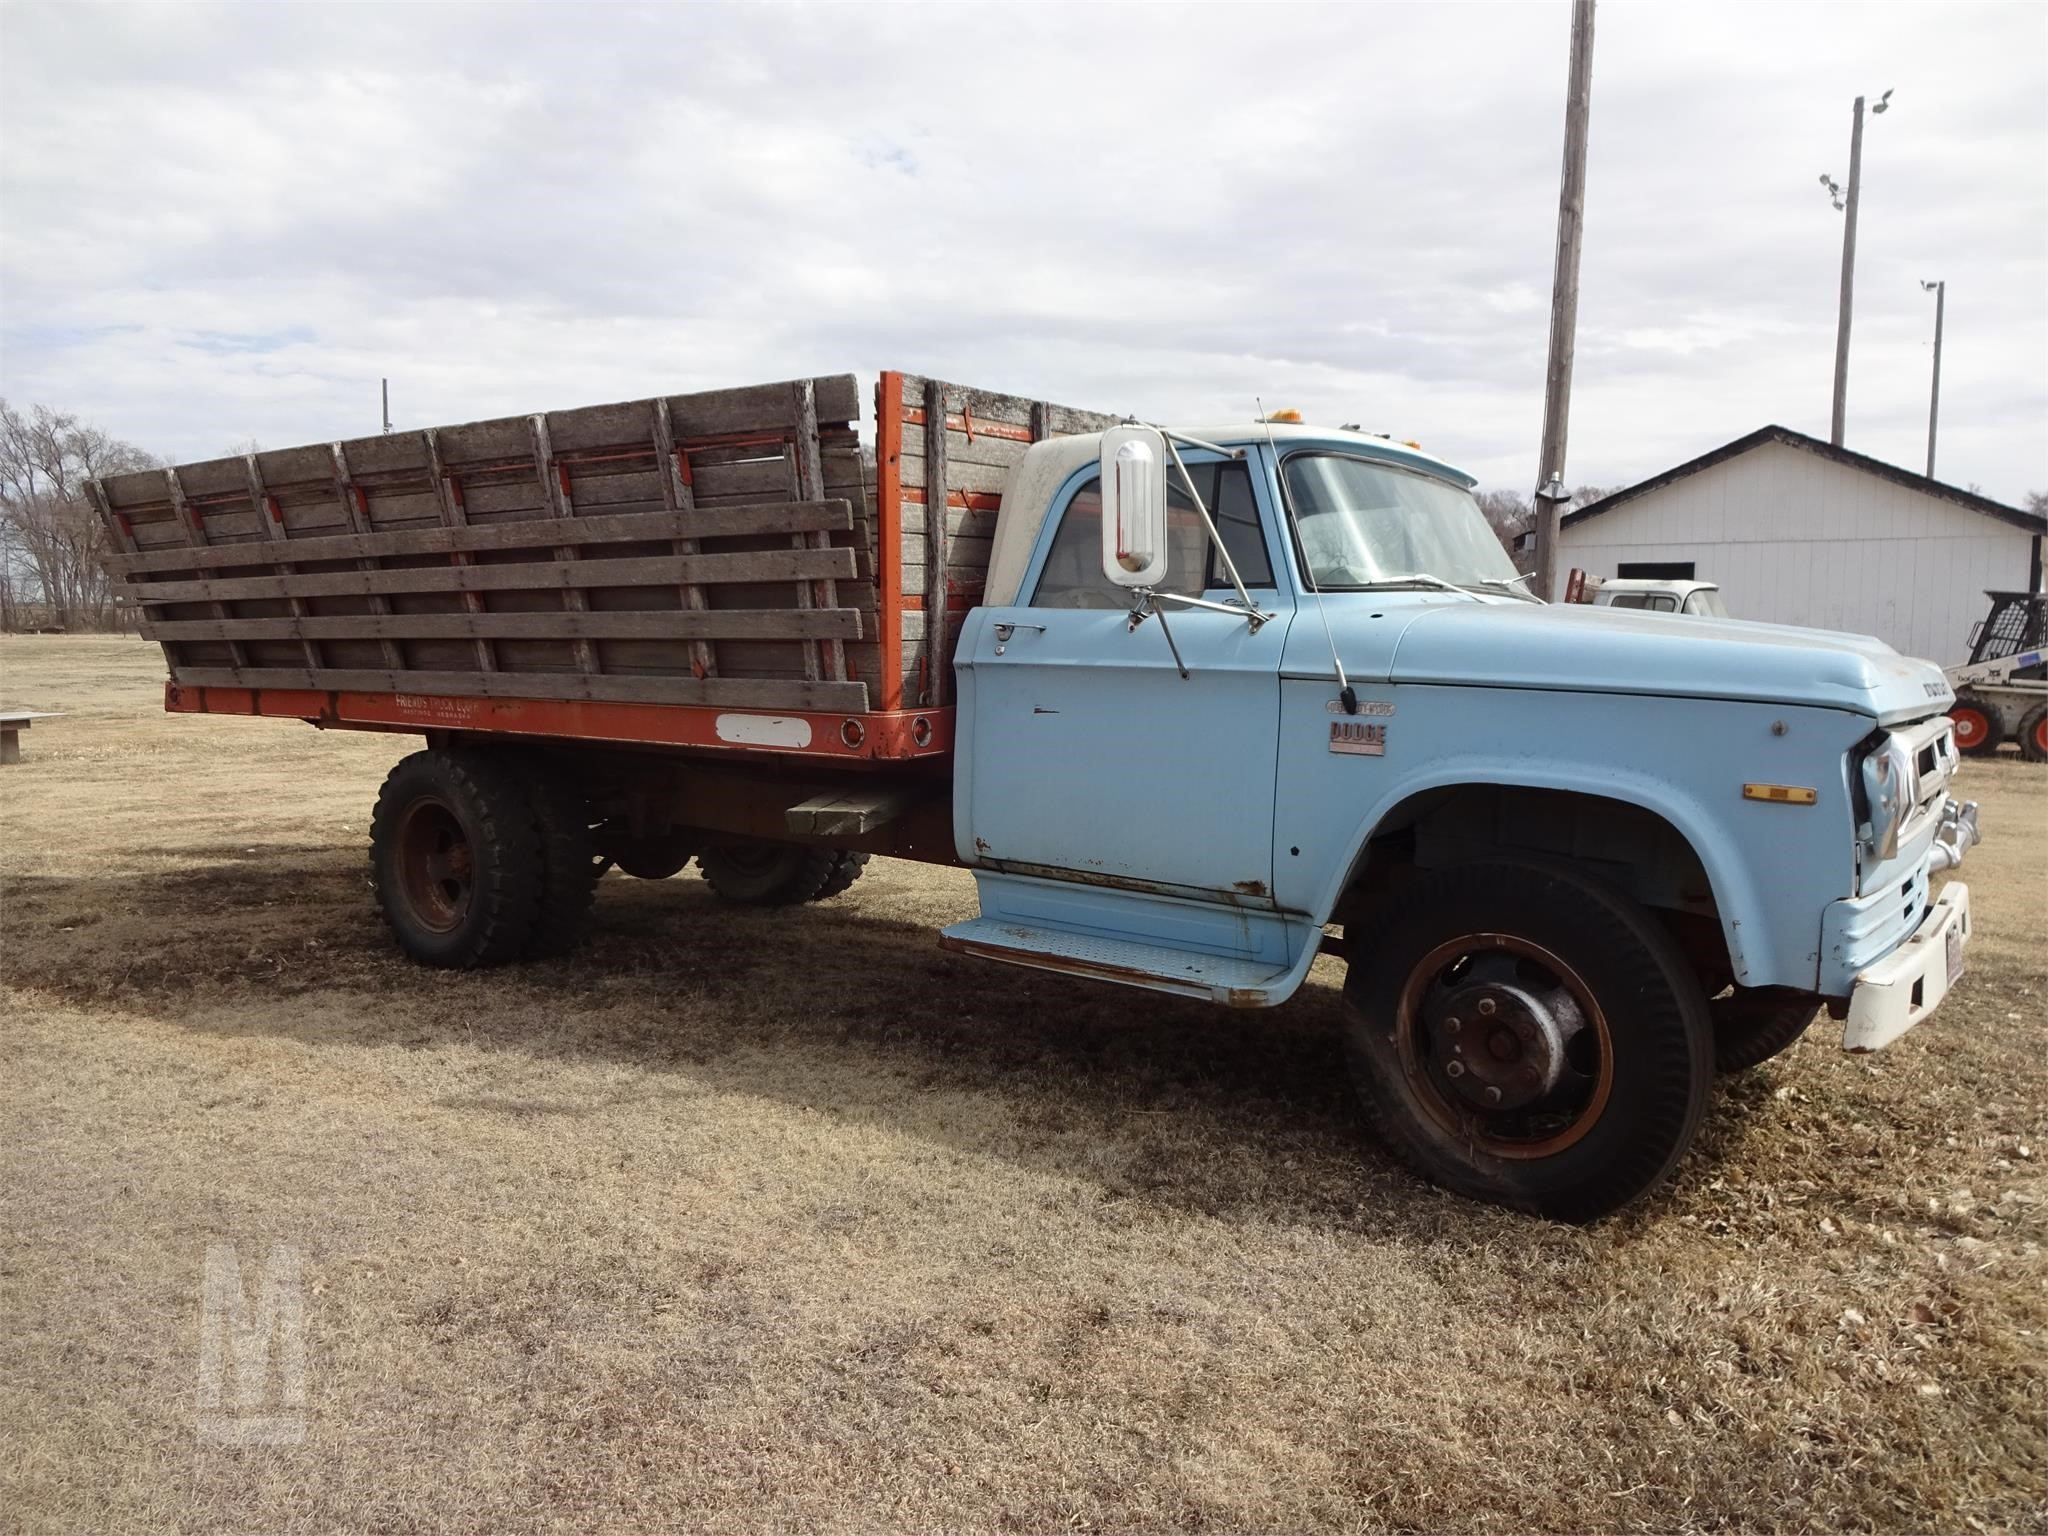 old dodge grain trucks for sale DODGE 2 Farm Trucks / Grain Trucks Auction Results - 2 Listings